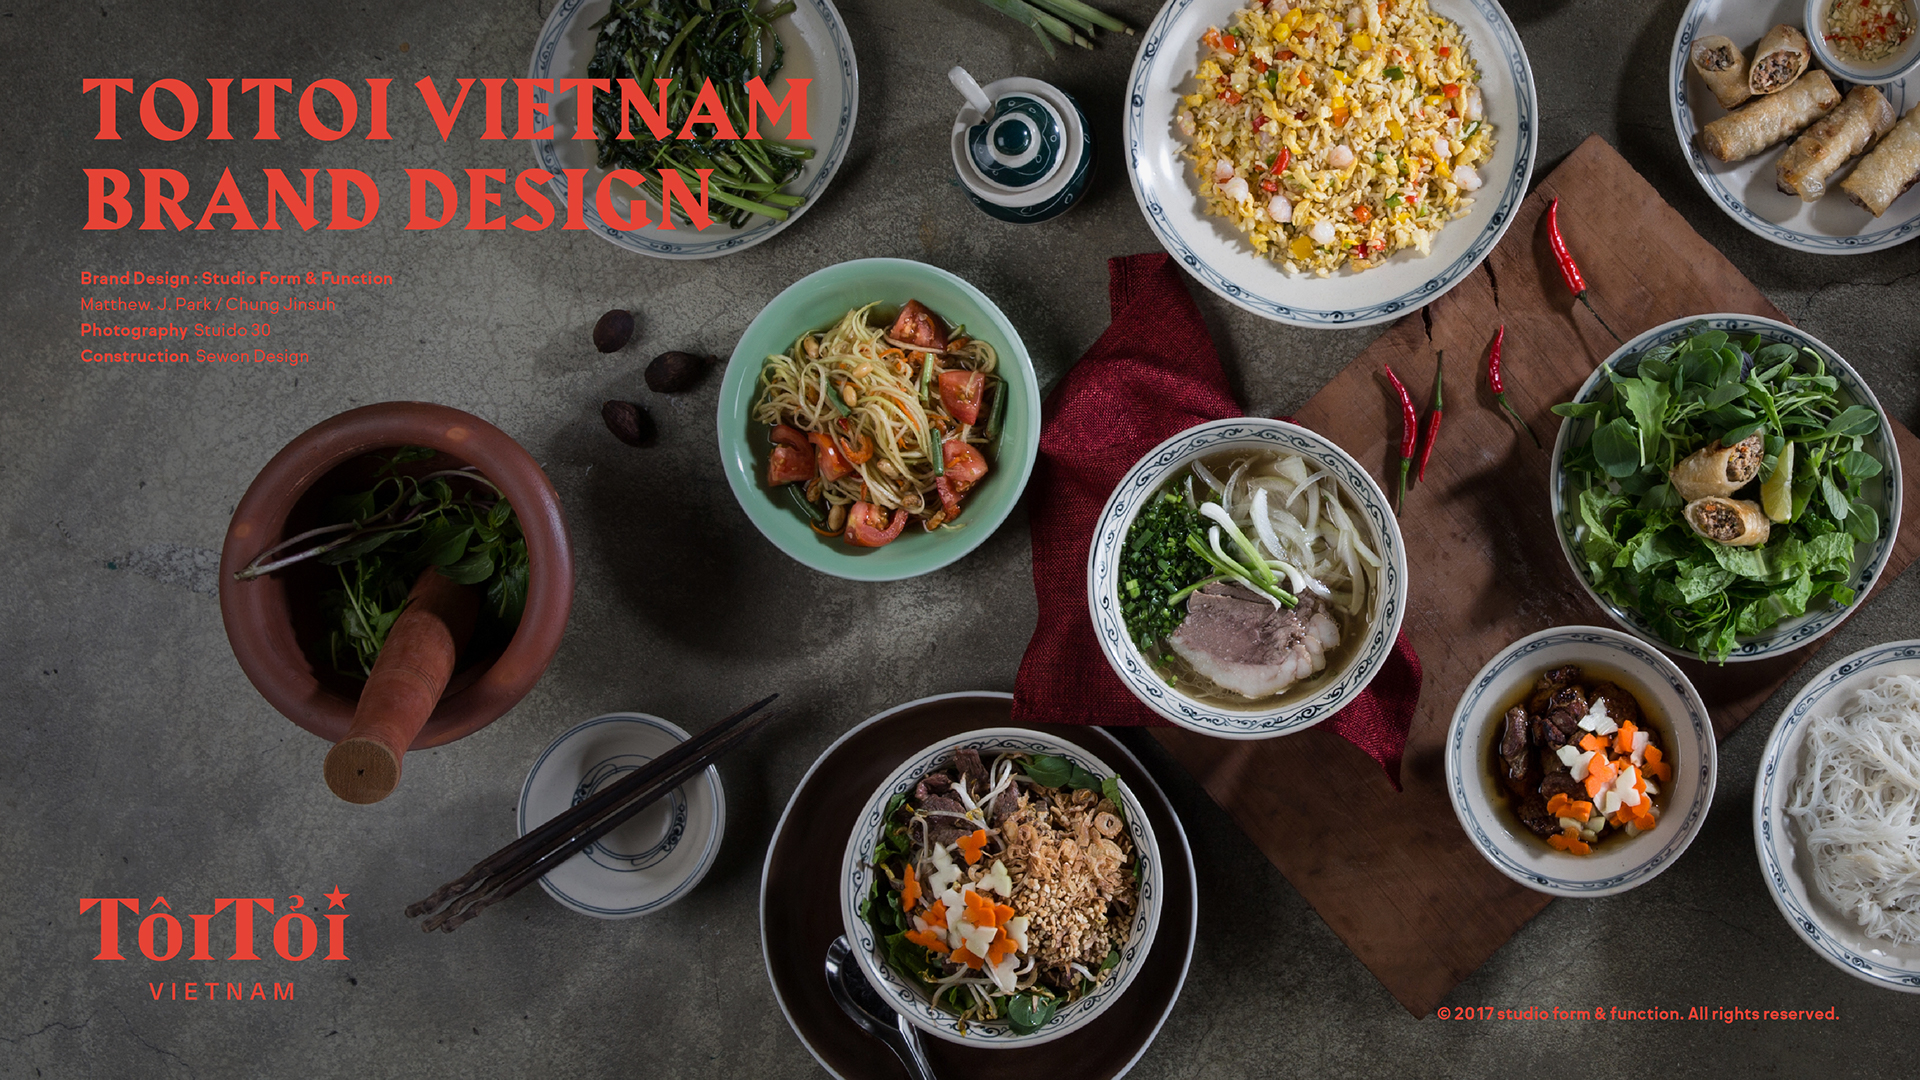 Toitoi Vietnam Restaurant Branding Grits Grids